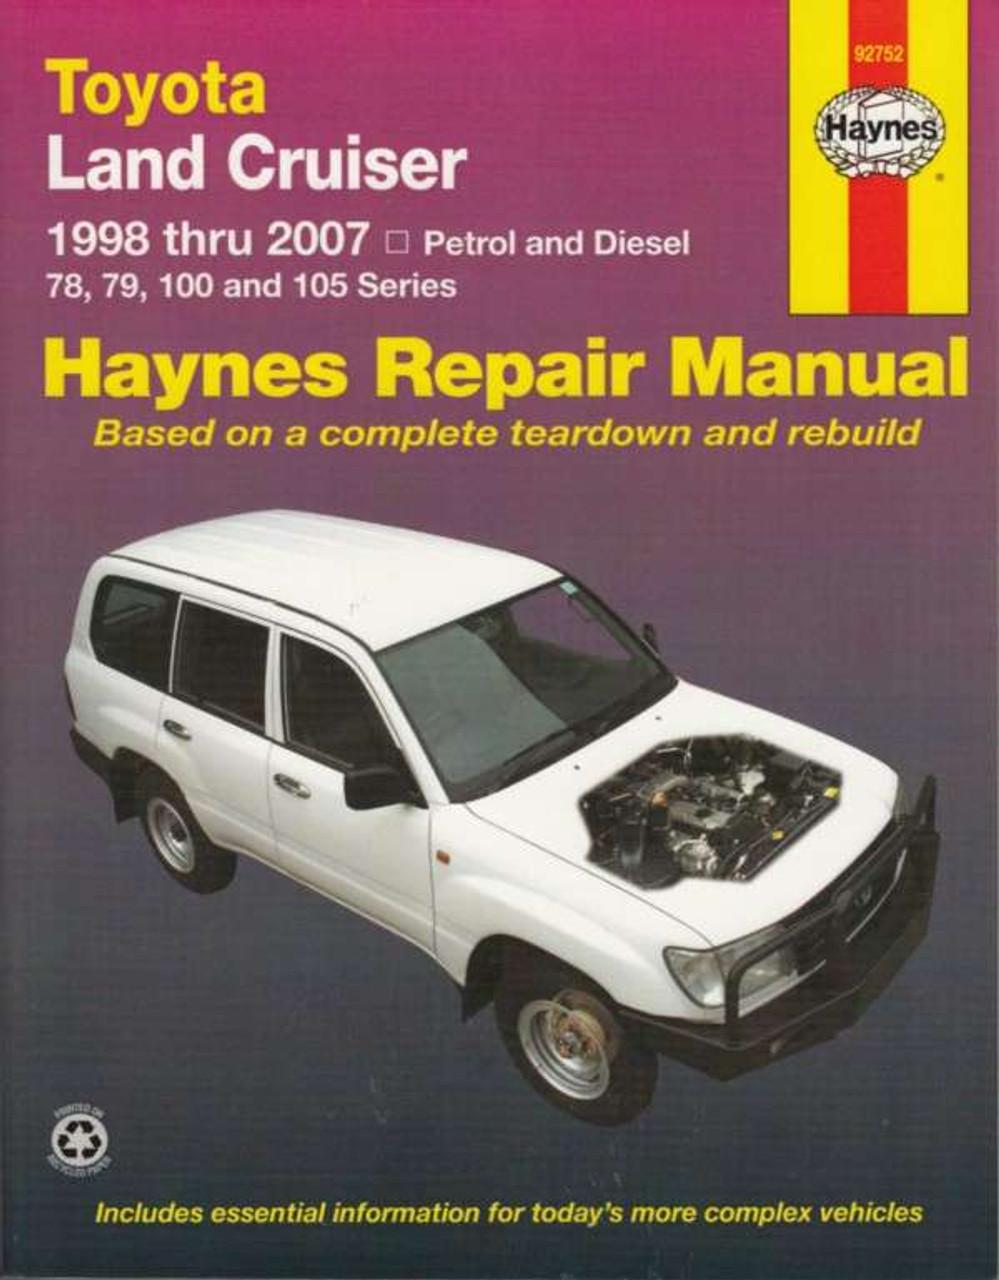 toyota land cruiser 78 79 100 105 petrol diesel 1998 2007 rh automotobookshop com au Land Cruiser 100 Series Built 100 series land cruiser repair manual